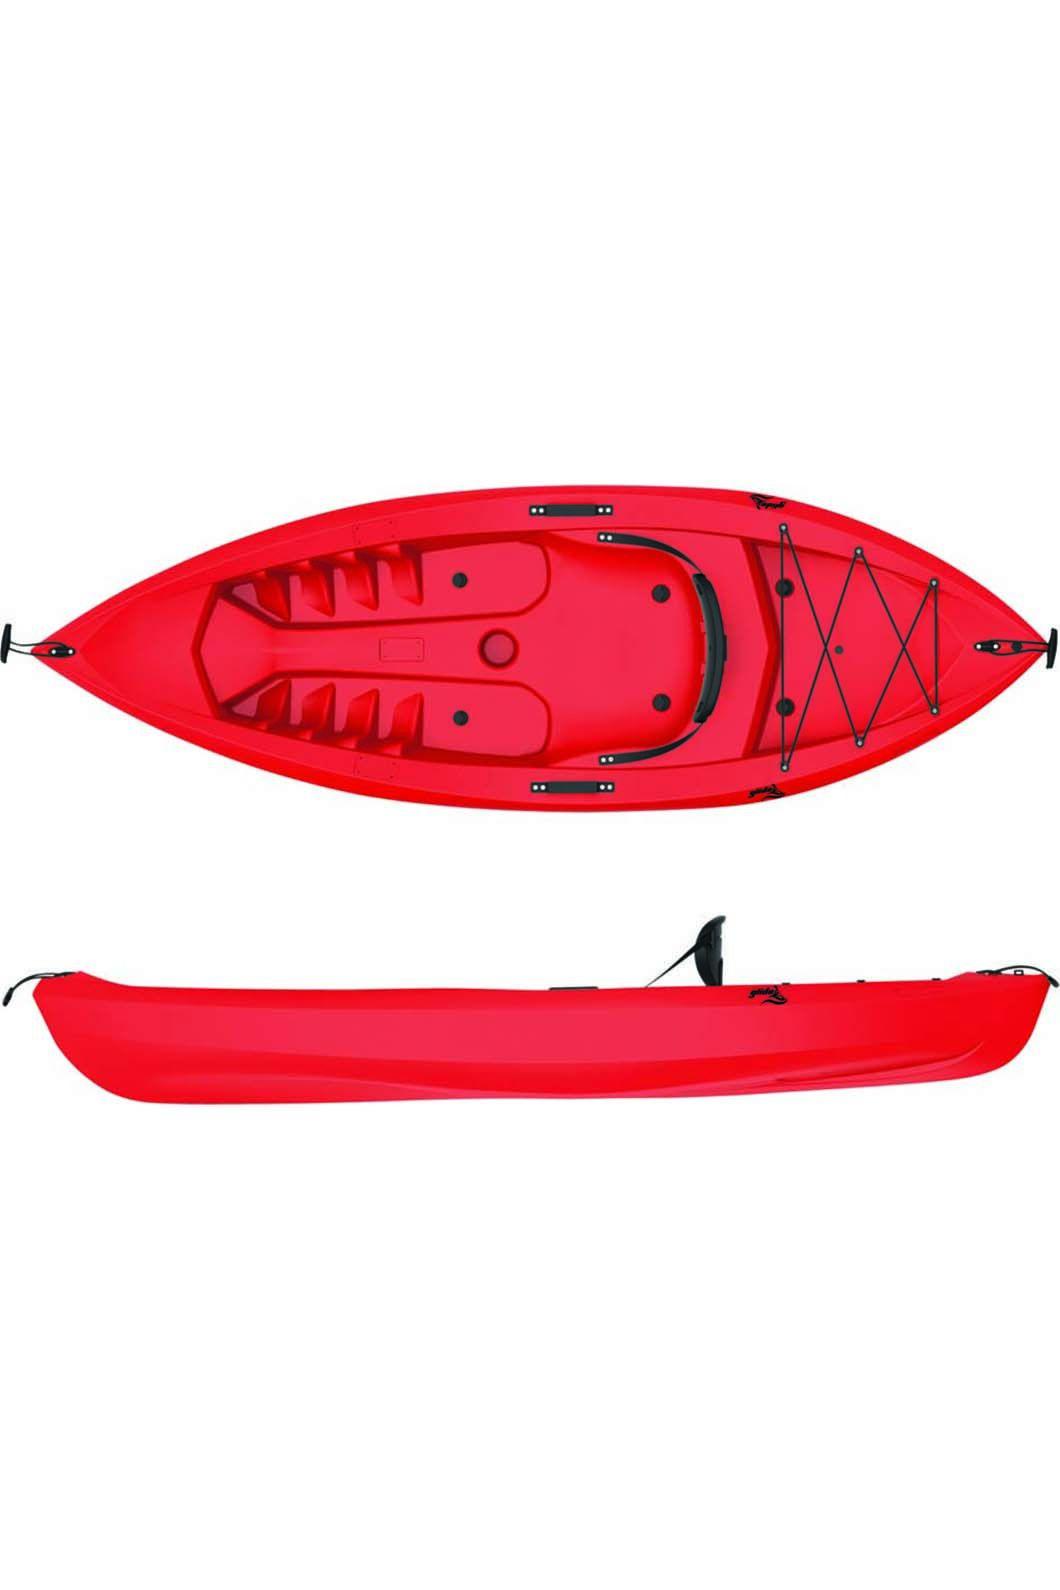 RFX2400 Sit On Top Kayak, None, hi-res